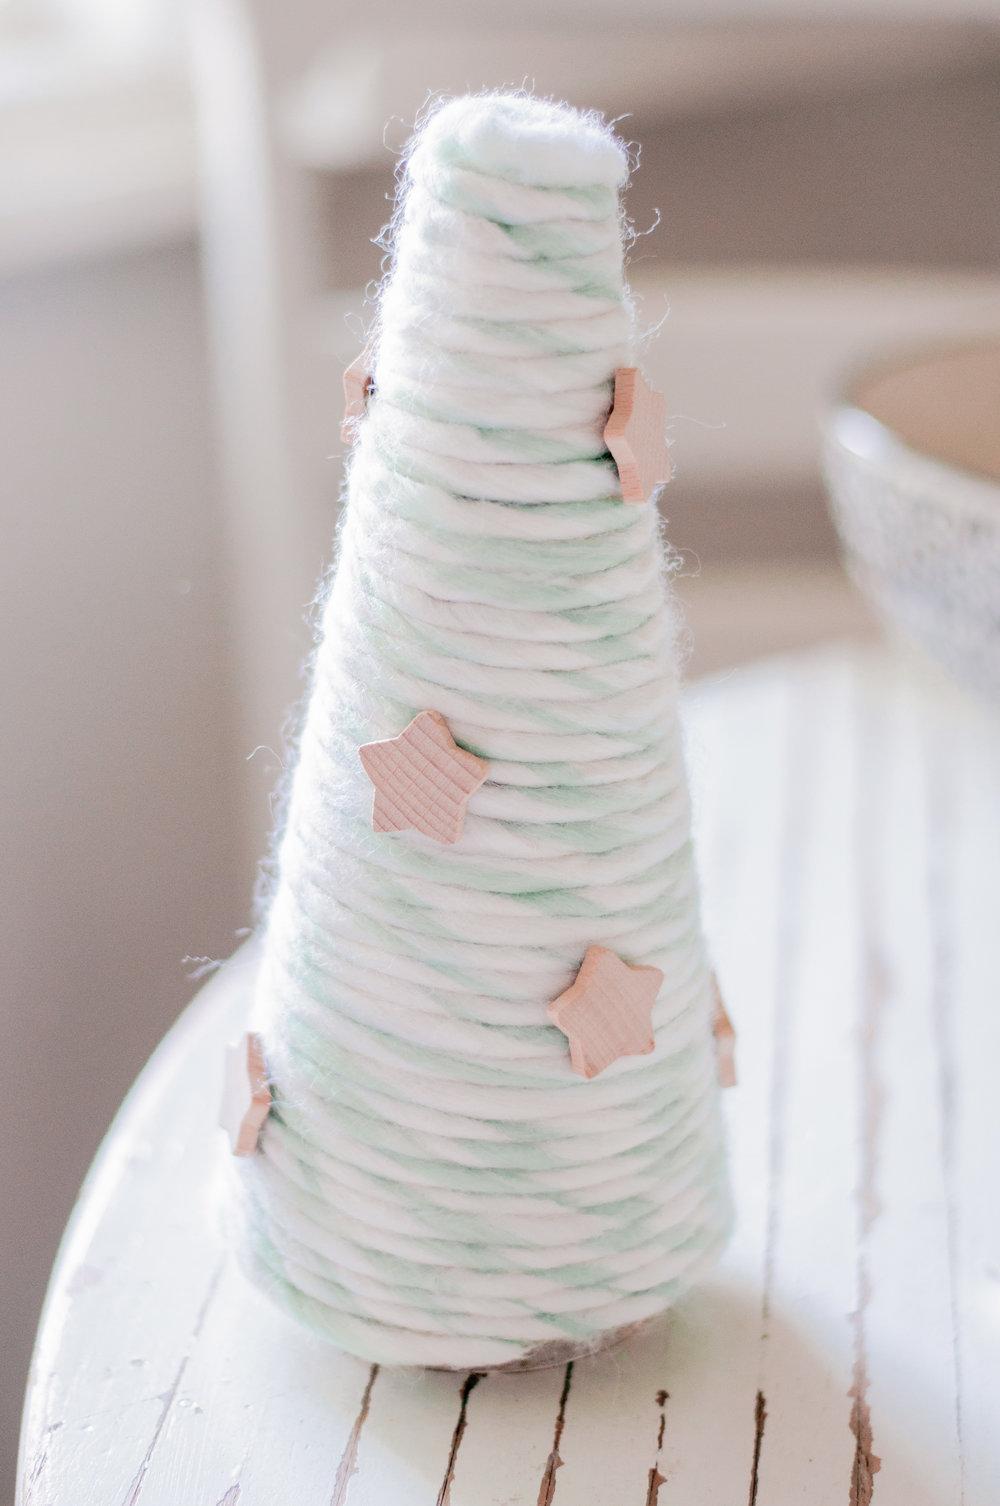 How to Make Yarn Trees